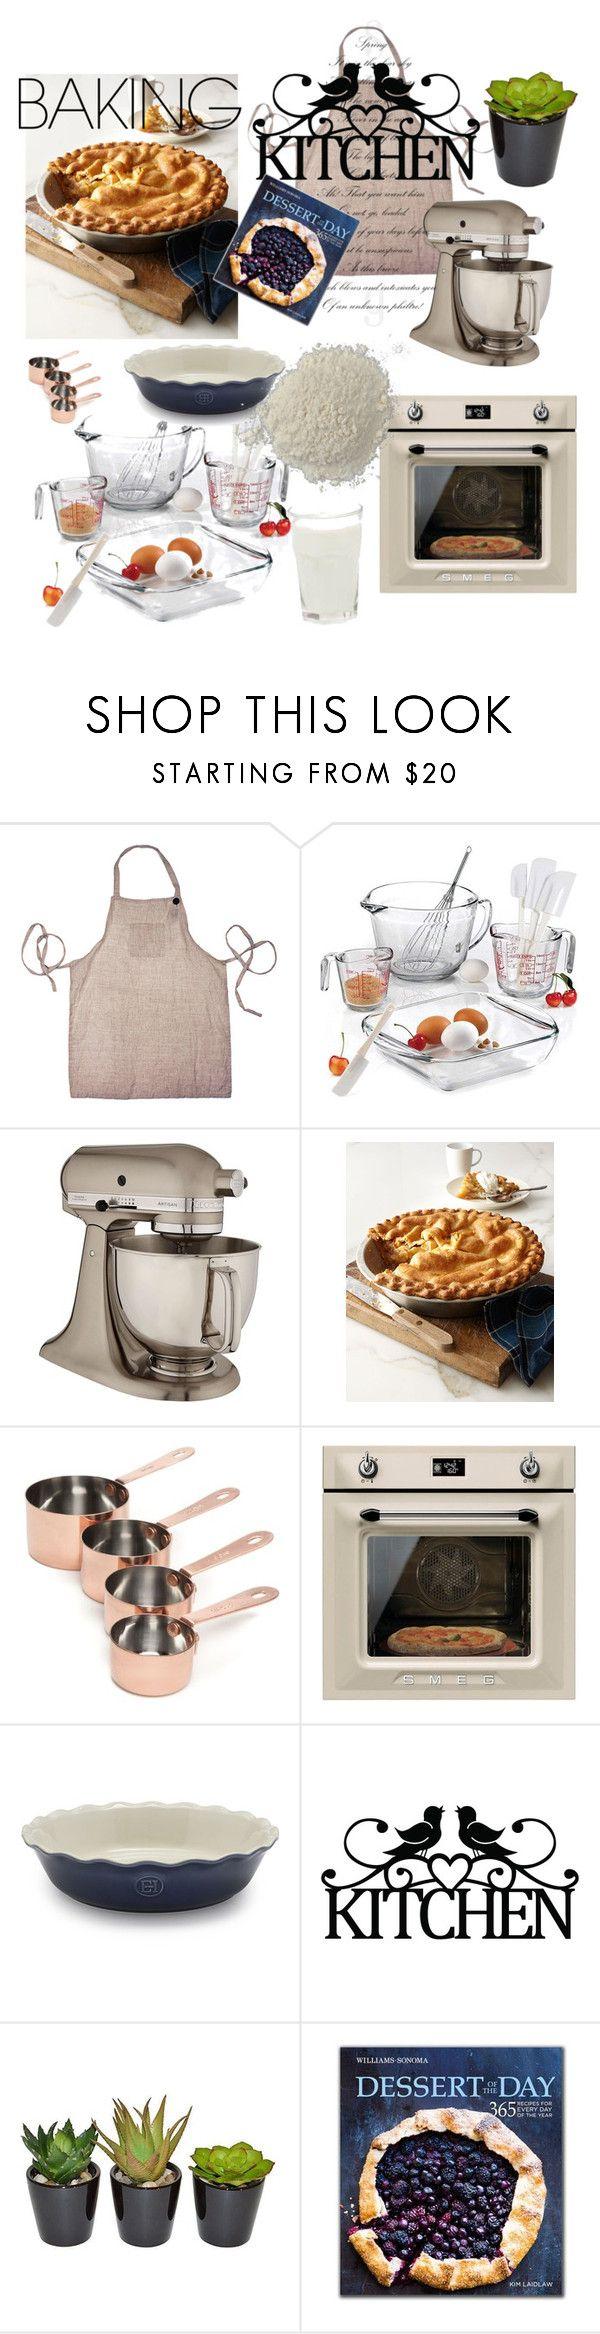 """Baking pie"" by korneliatheocharid ❤ liked on Polyvore featuring interior, interiors, interior design, home, home decor, interior decorating, Farmhouse Pottery, Anchor Hocking, KitchenAid and Sweet Lady Jane"